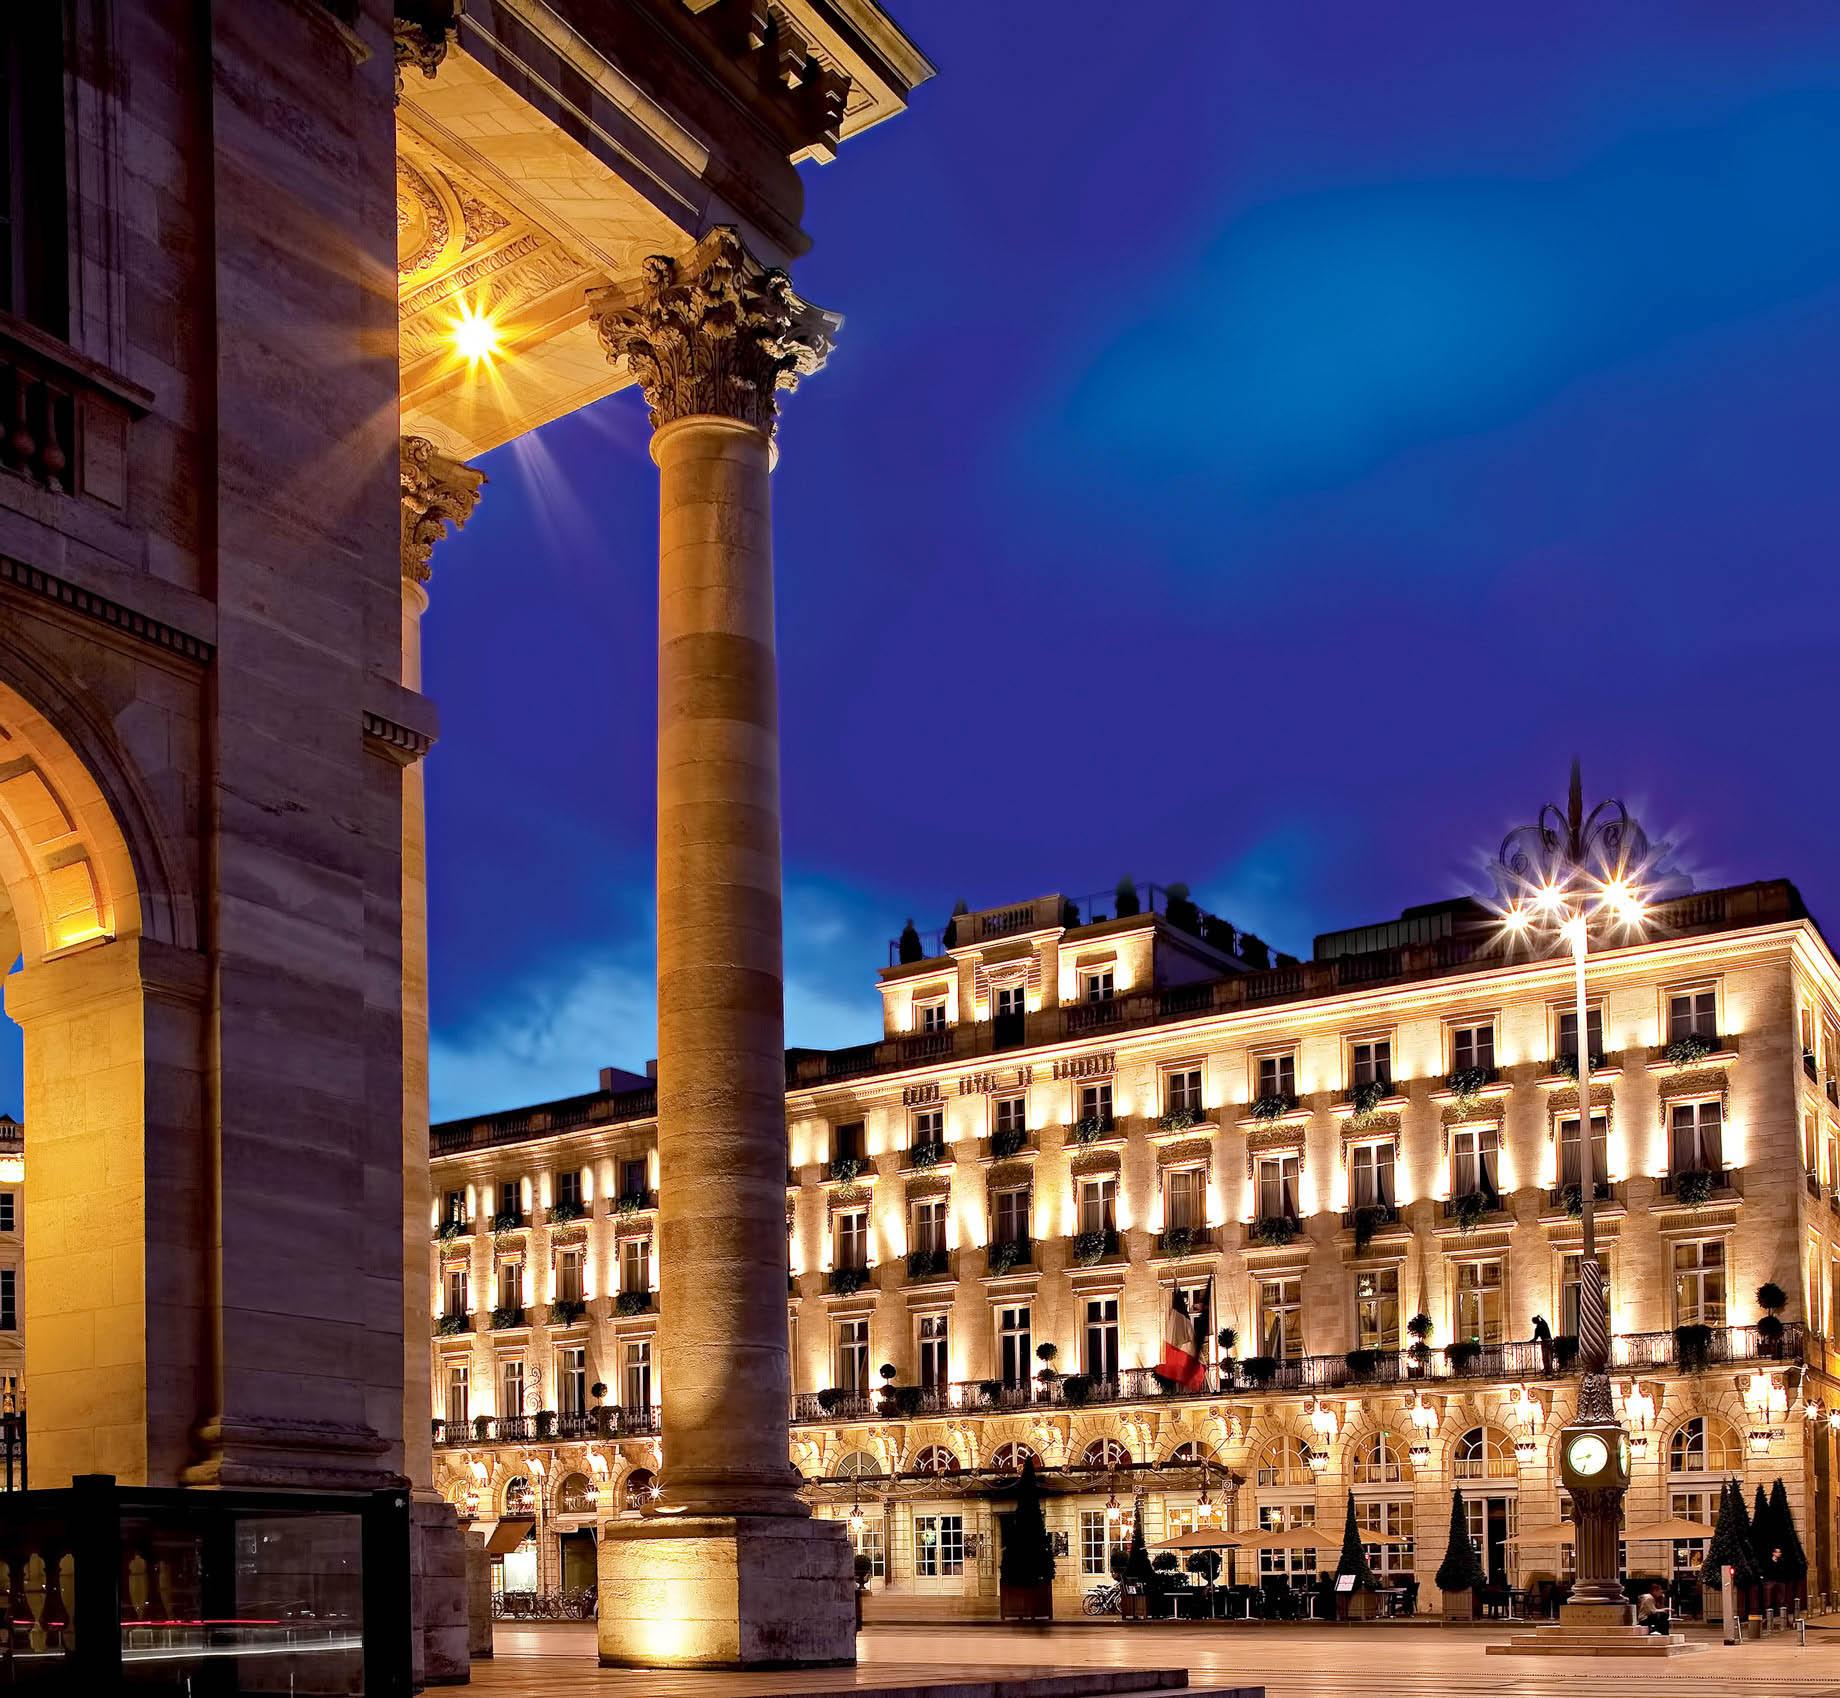 InterContinental Bordeaux Le Grand Hotel – Bordeaux, France – Night Architectural View